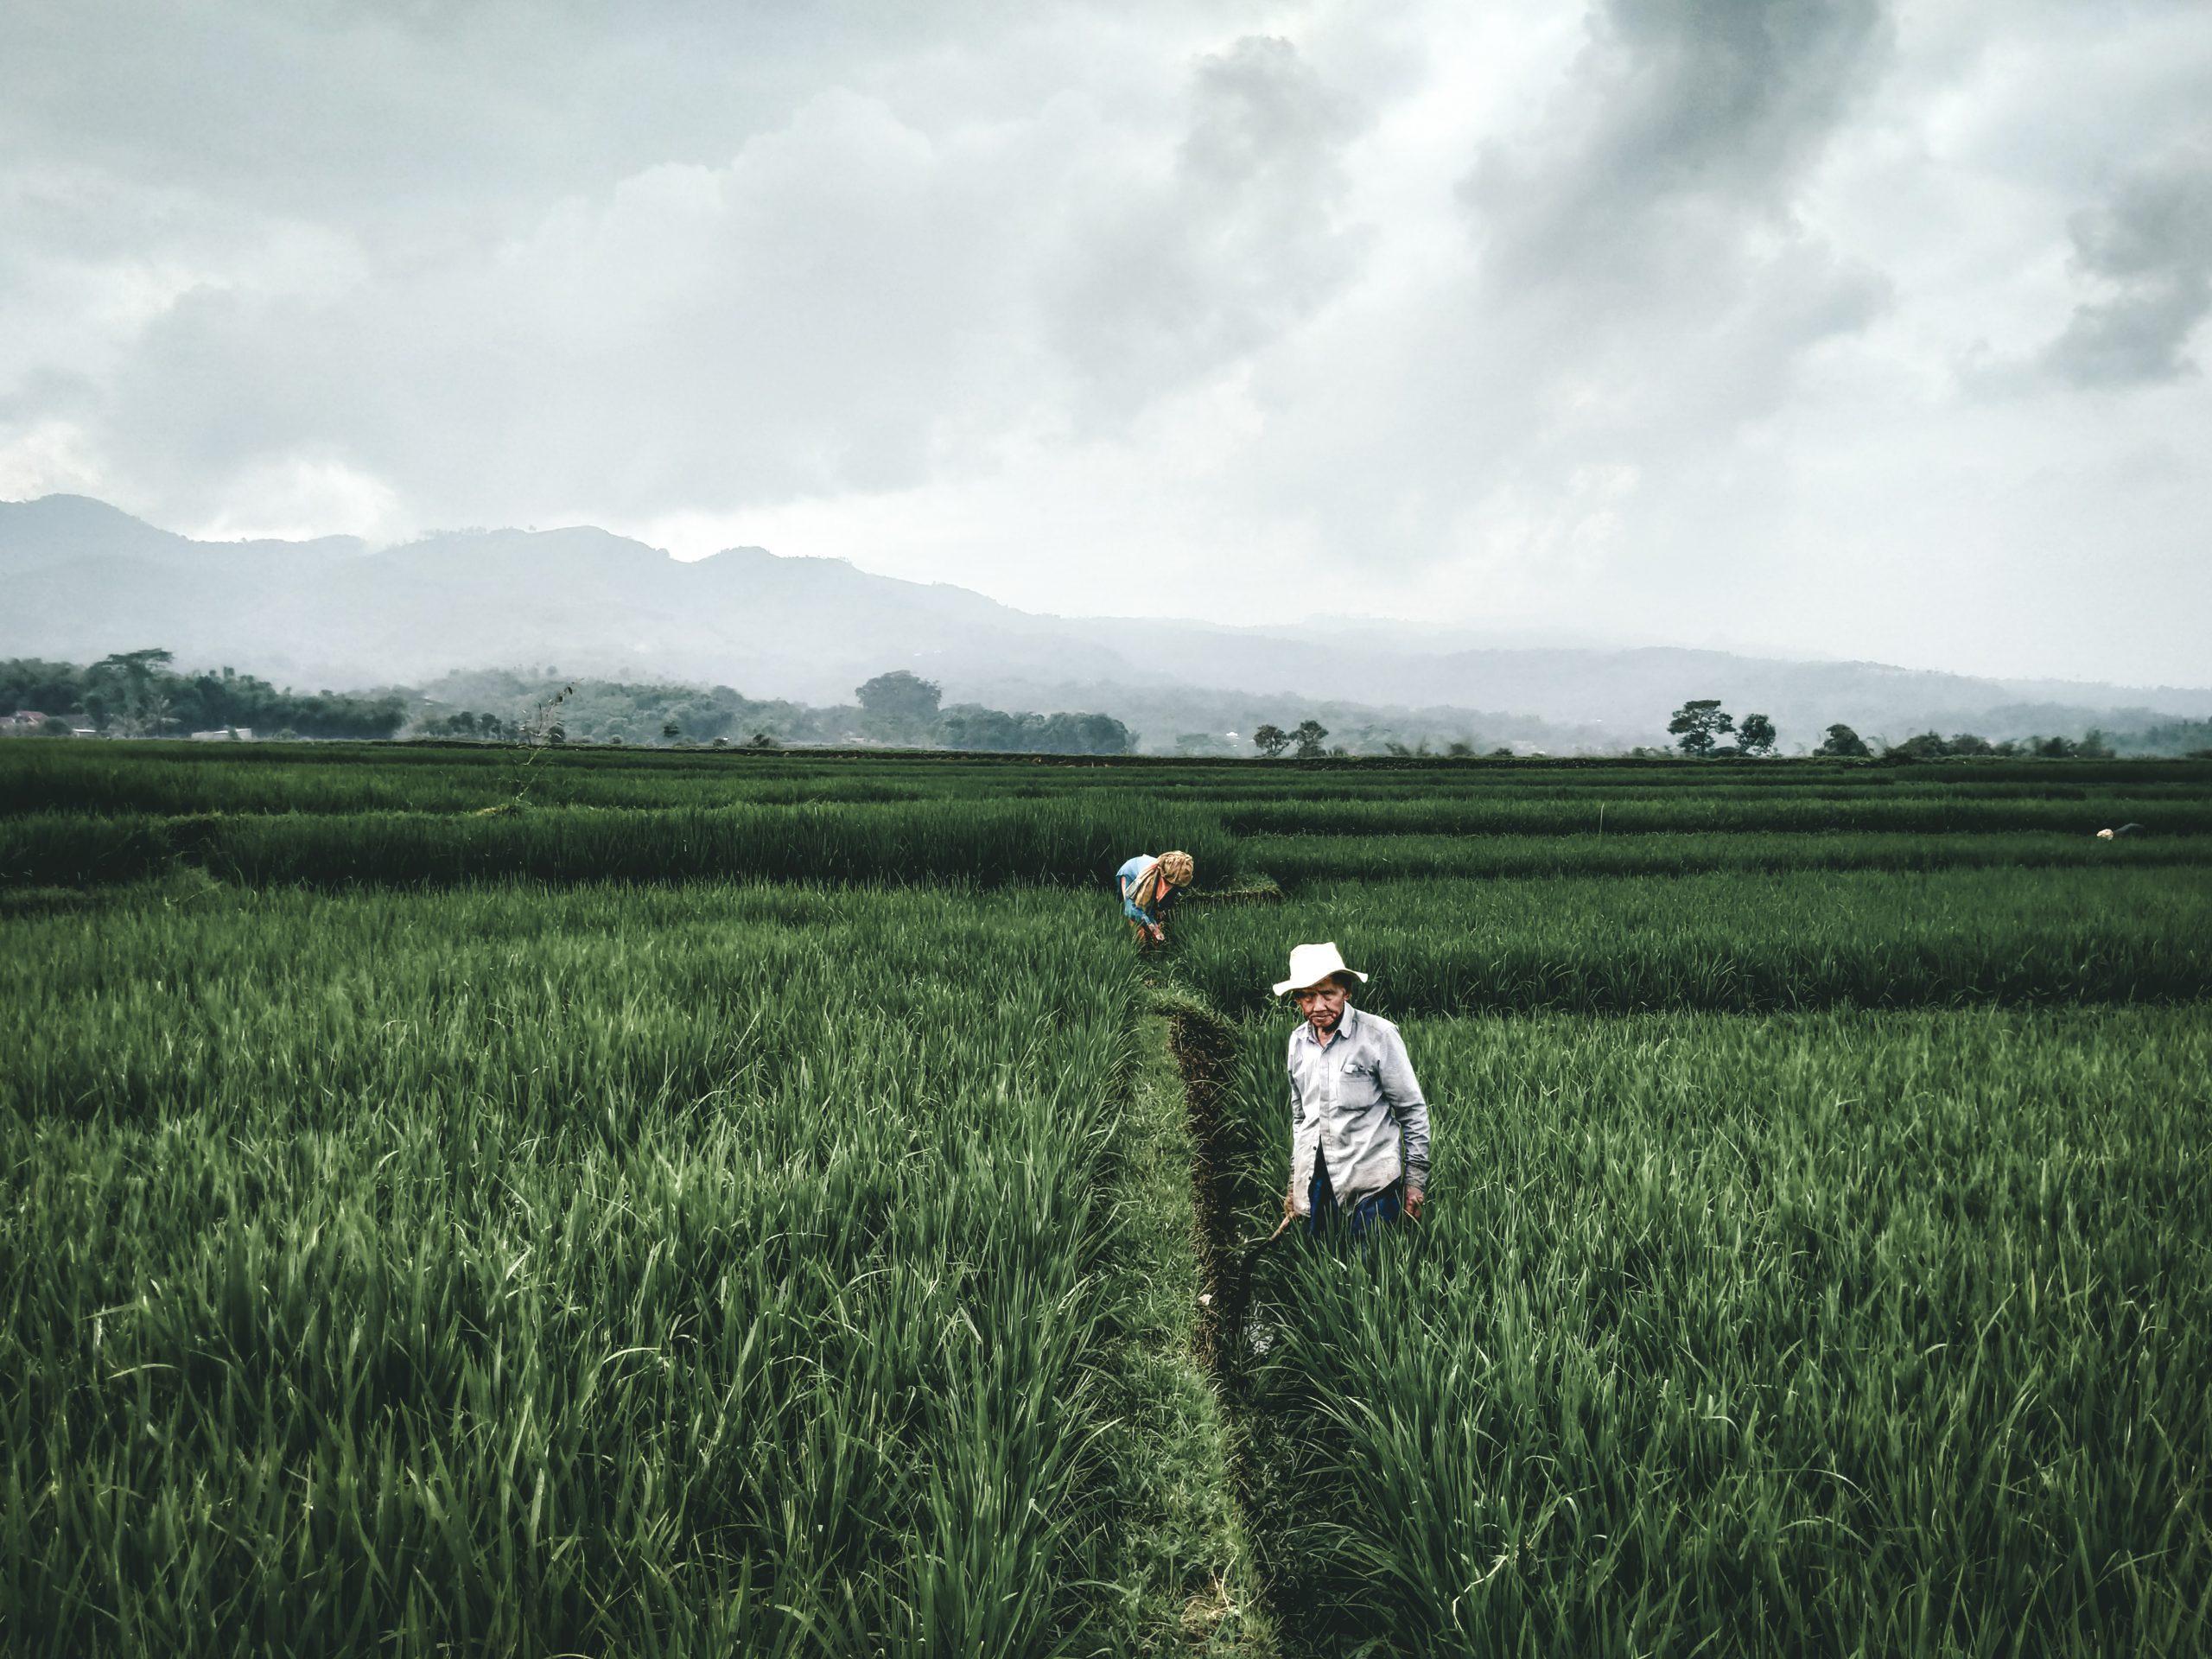 girl in white dress walking on green grass field during daytime